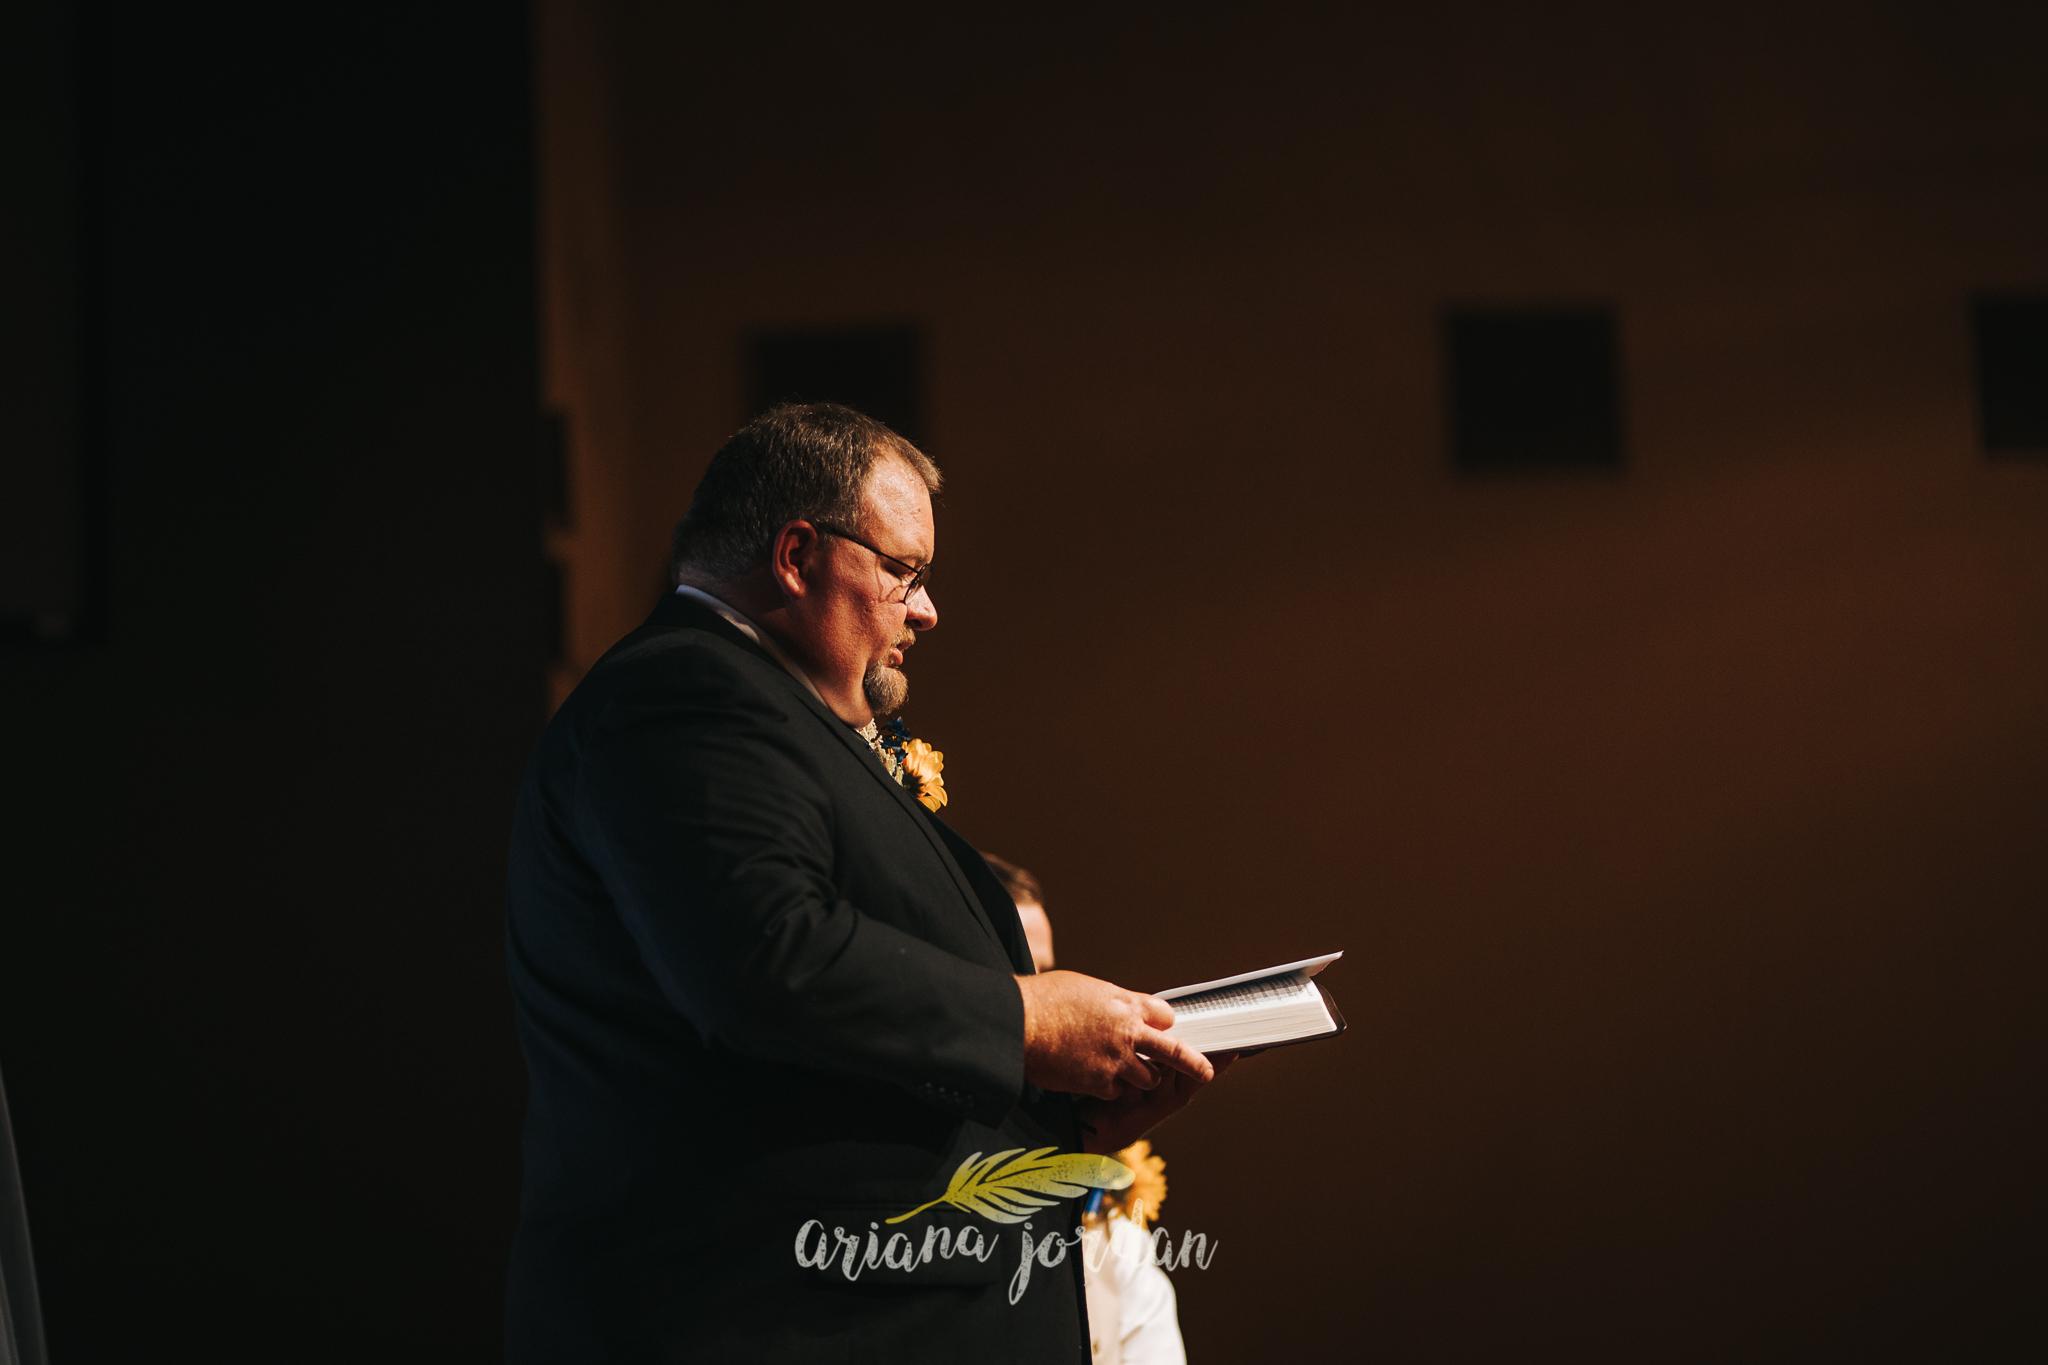 0029 Ariana Jordan Photography - Georgetown KY Wedding Photographer 6169.jpg